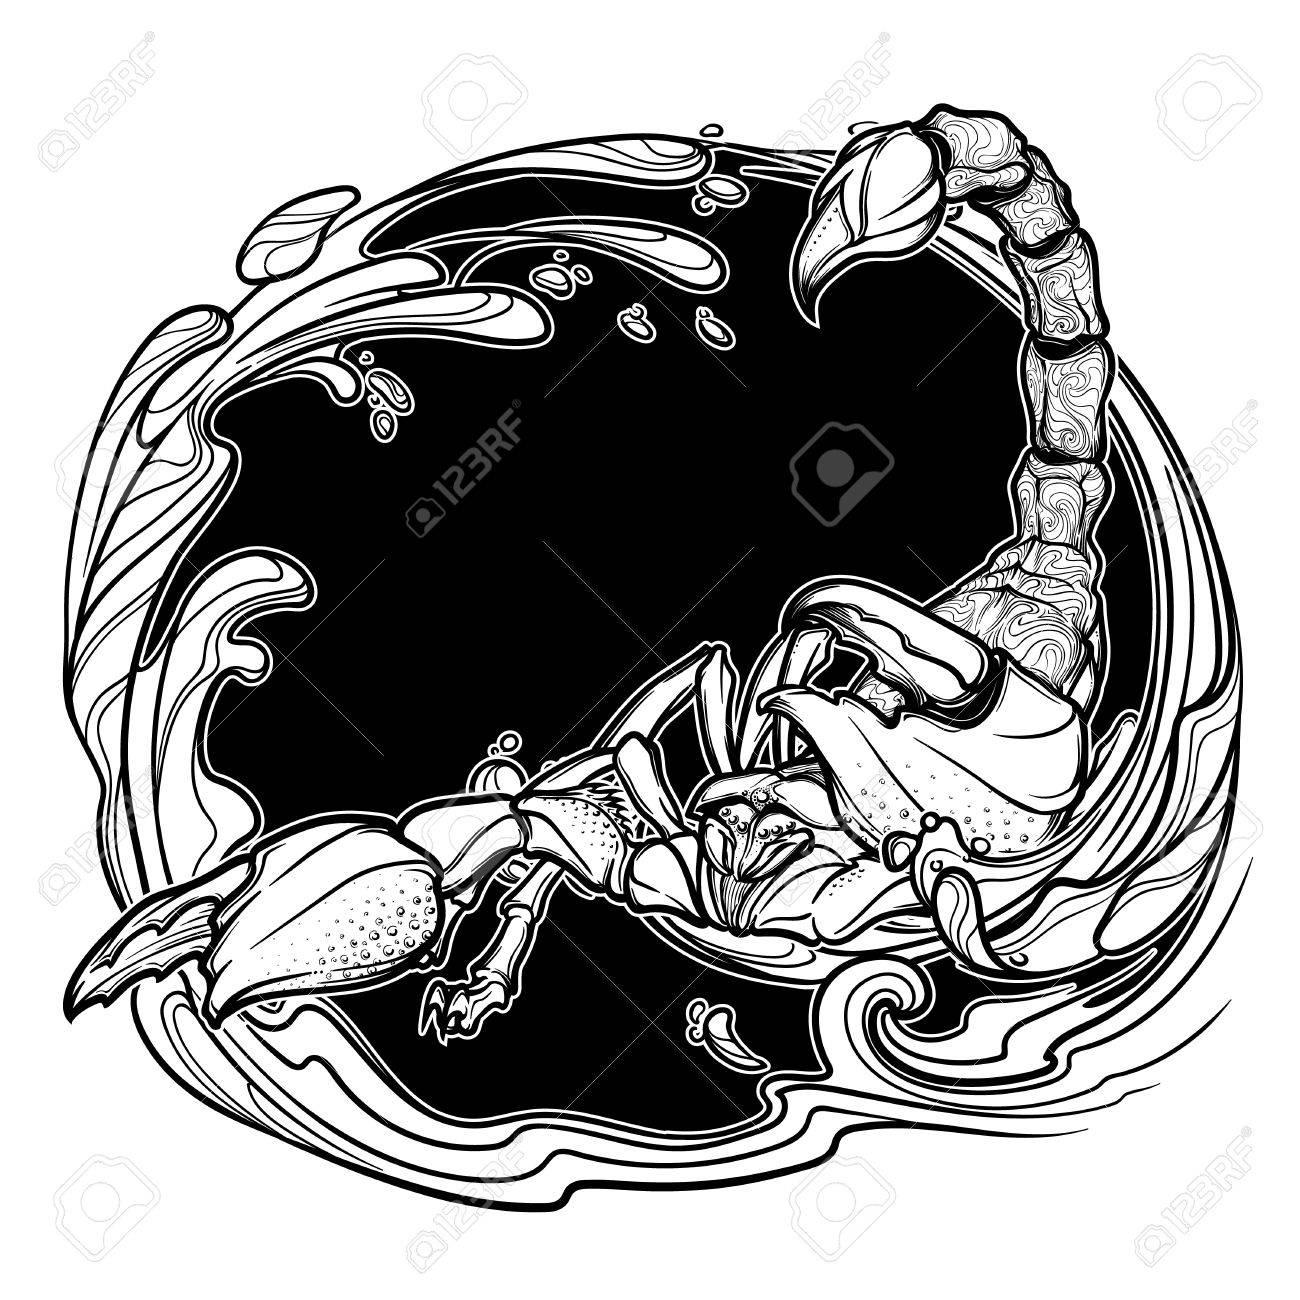 1300x1300 Alchemy Element Of Water. Zodiac Sign Scorpio. Detailed Realistic